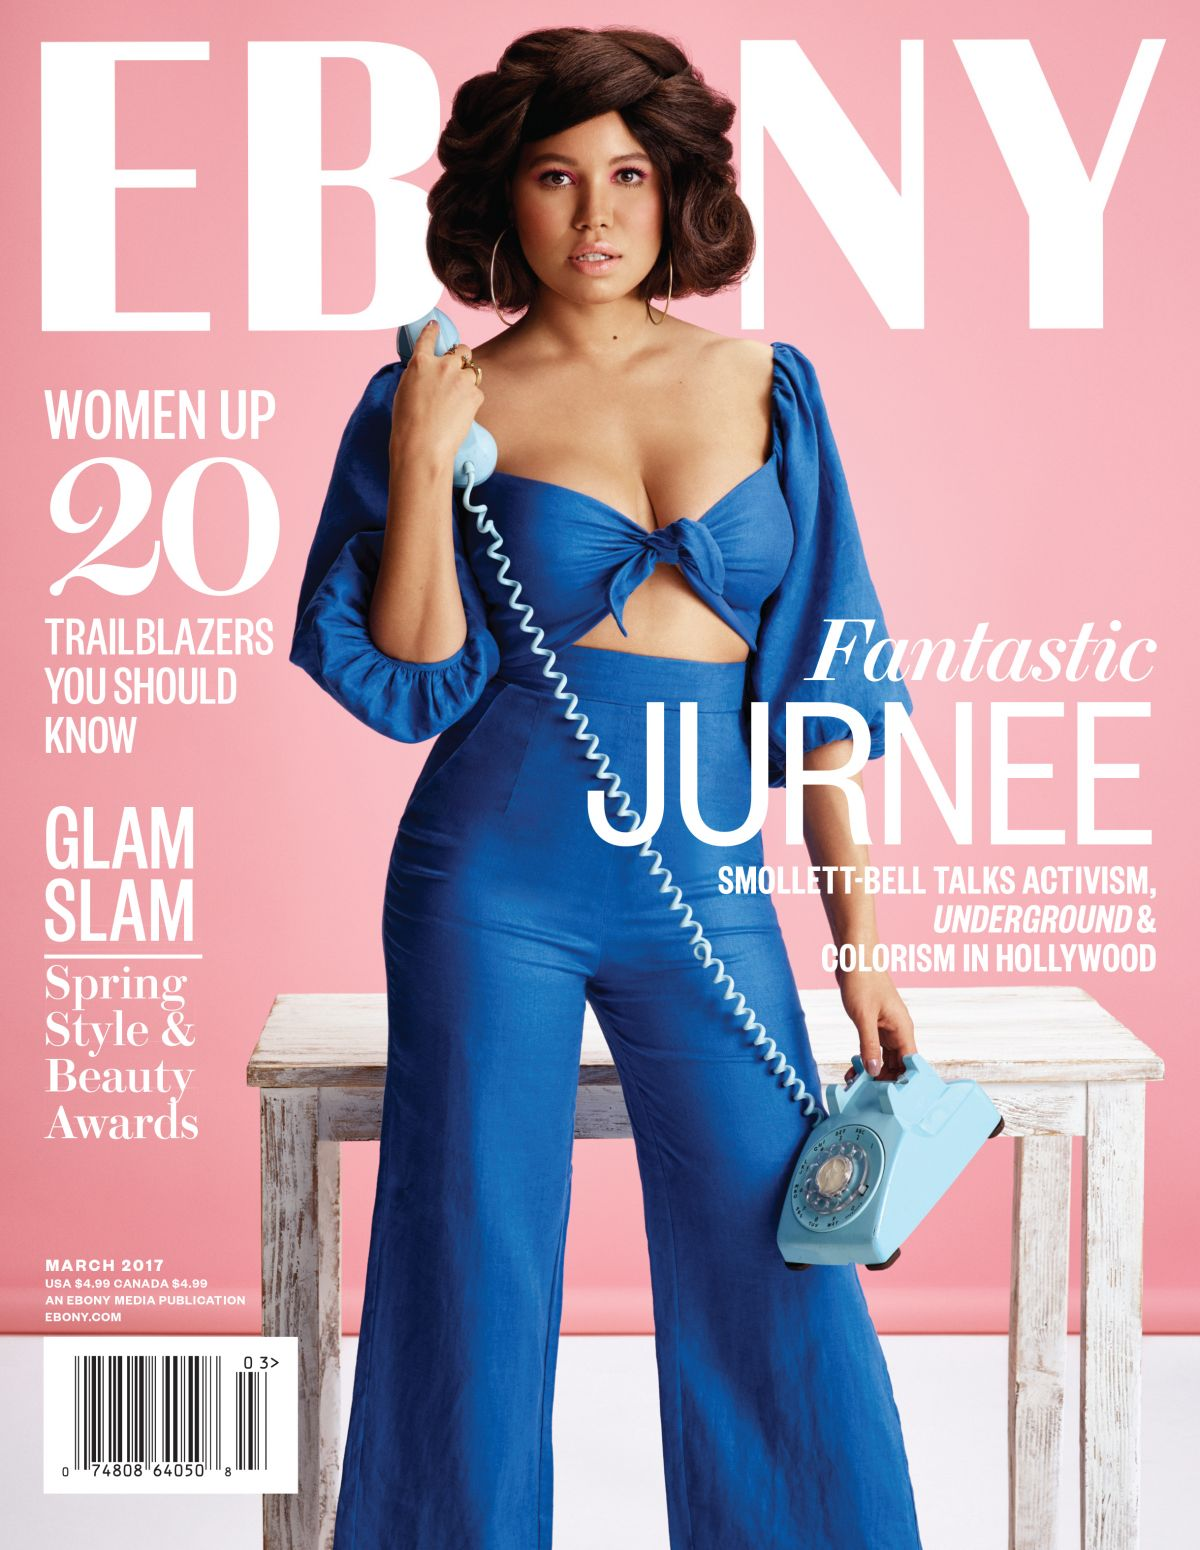 JURNEE SMOLLETT in Ebony Magazine, March 2017